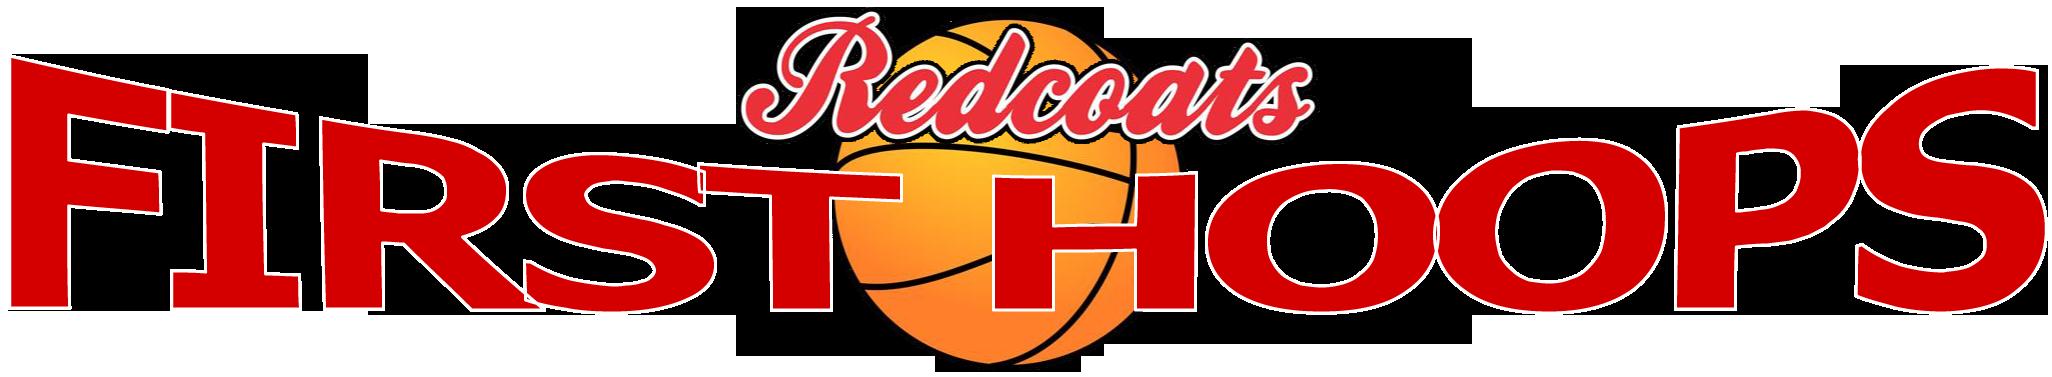 First Hoops Logo